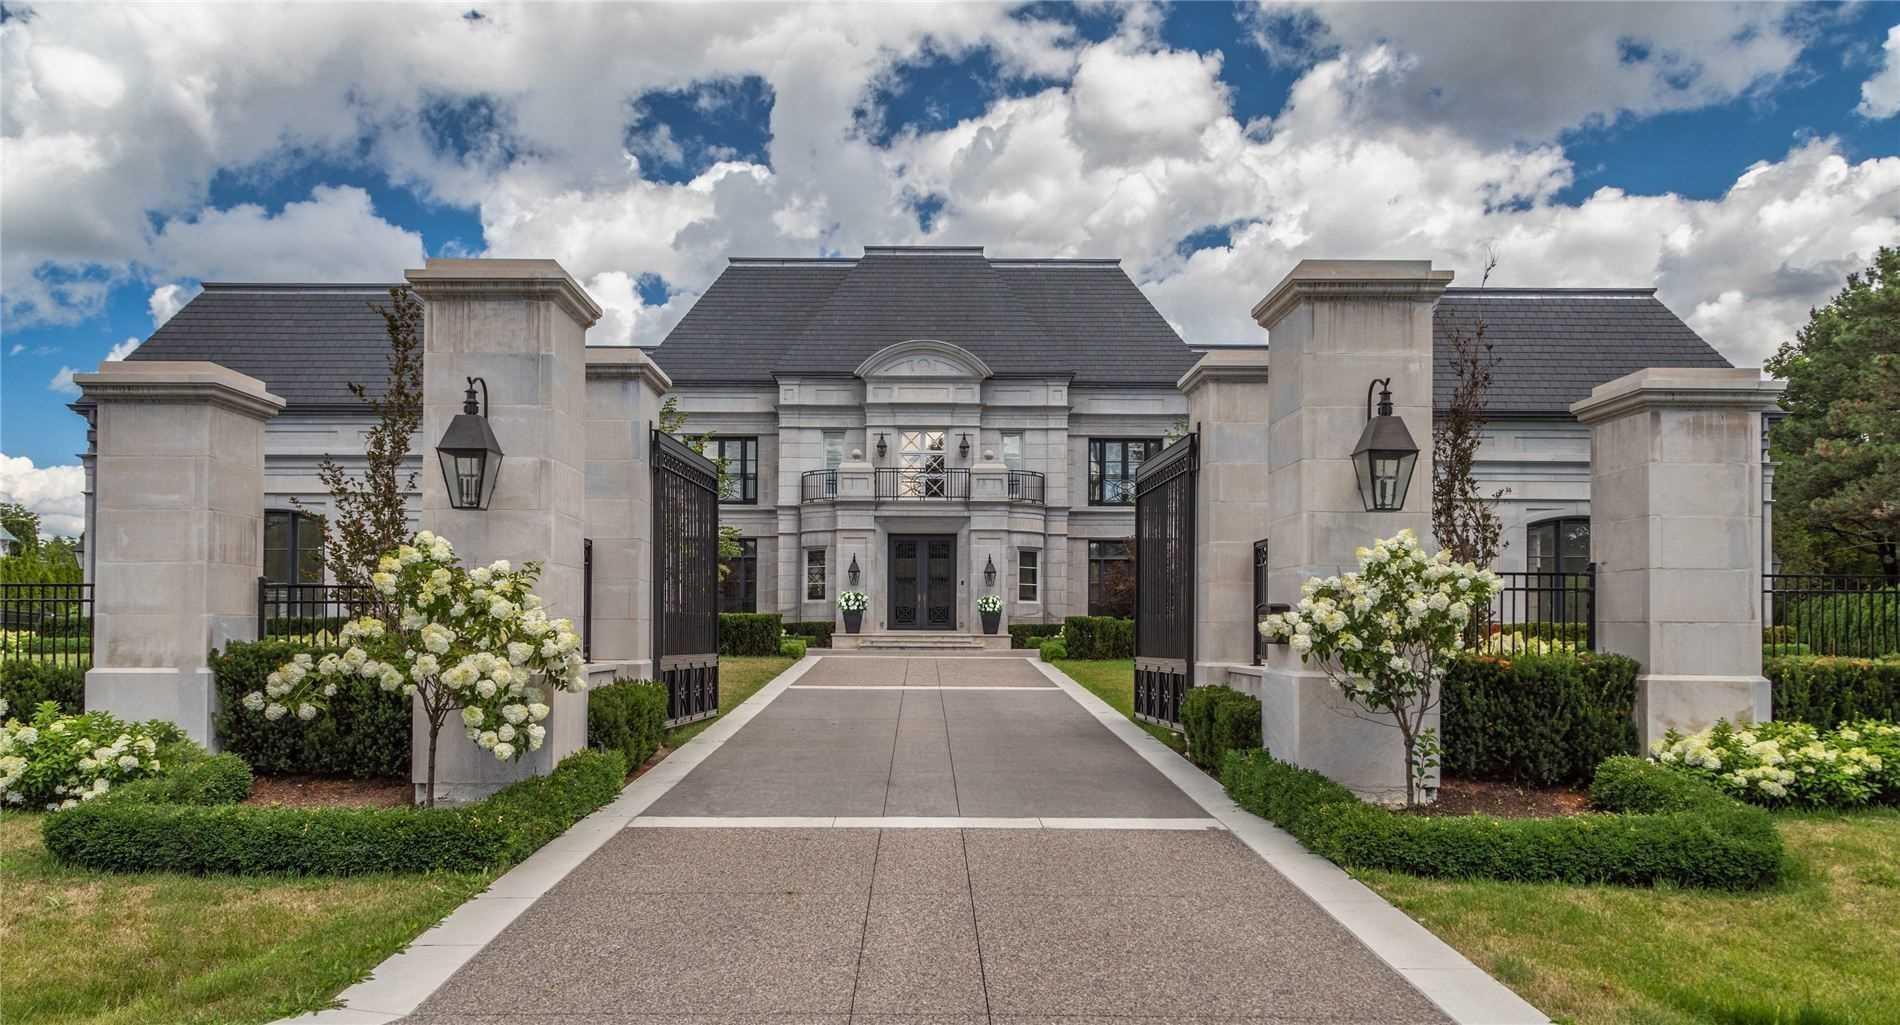 246 Pine Valley Cres, Vaughan | $19,900,000 | newstreet.ca